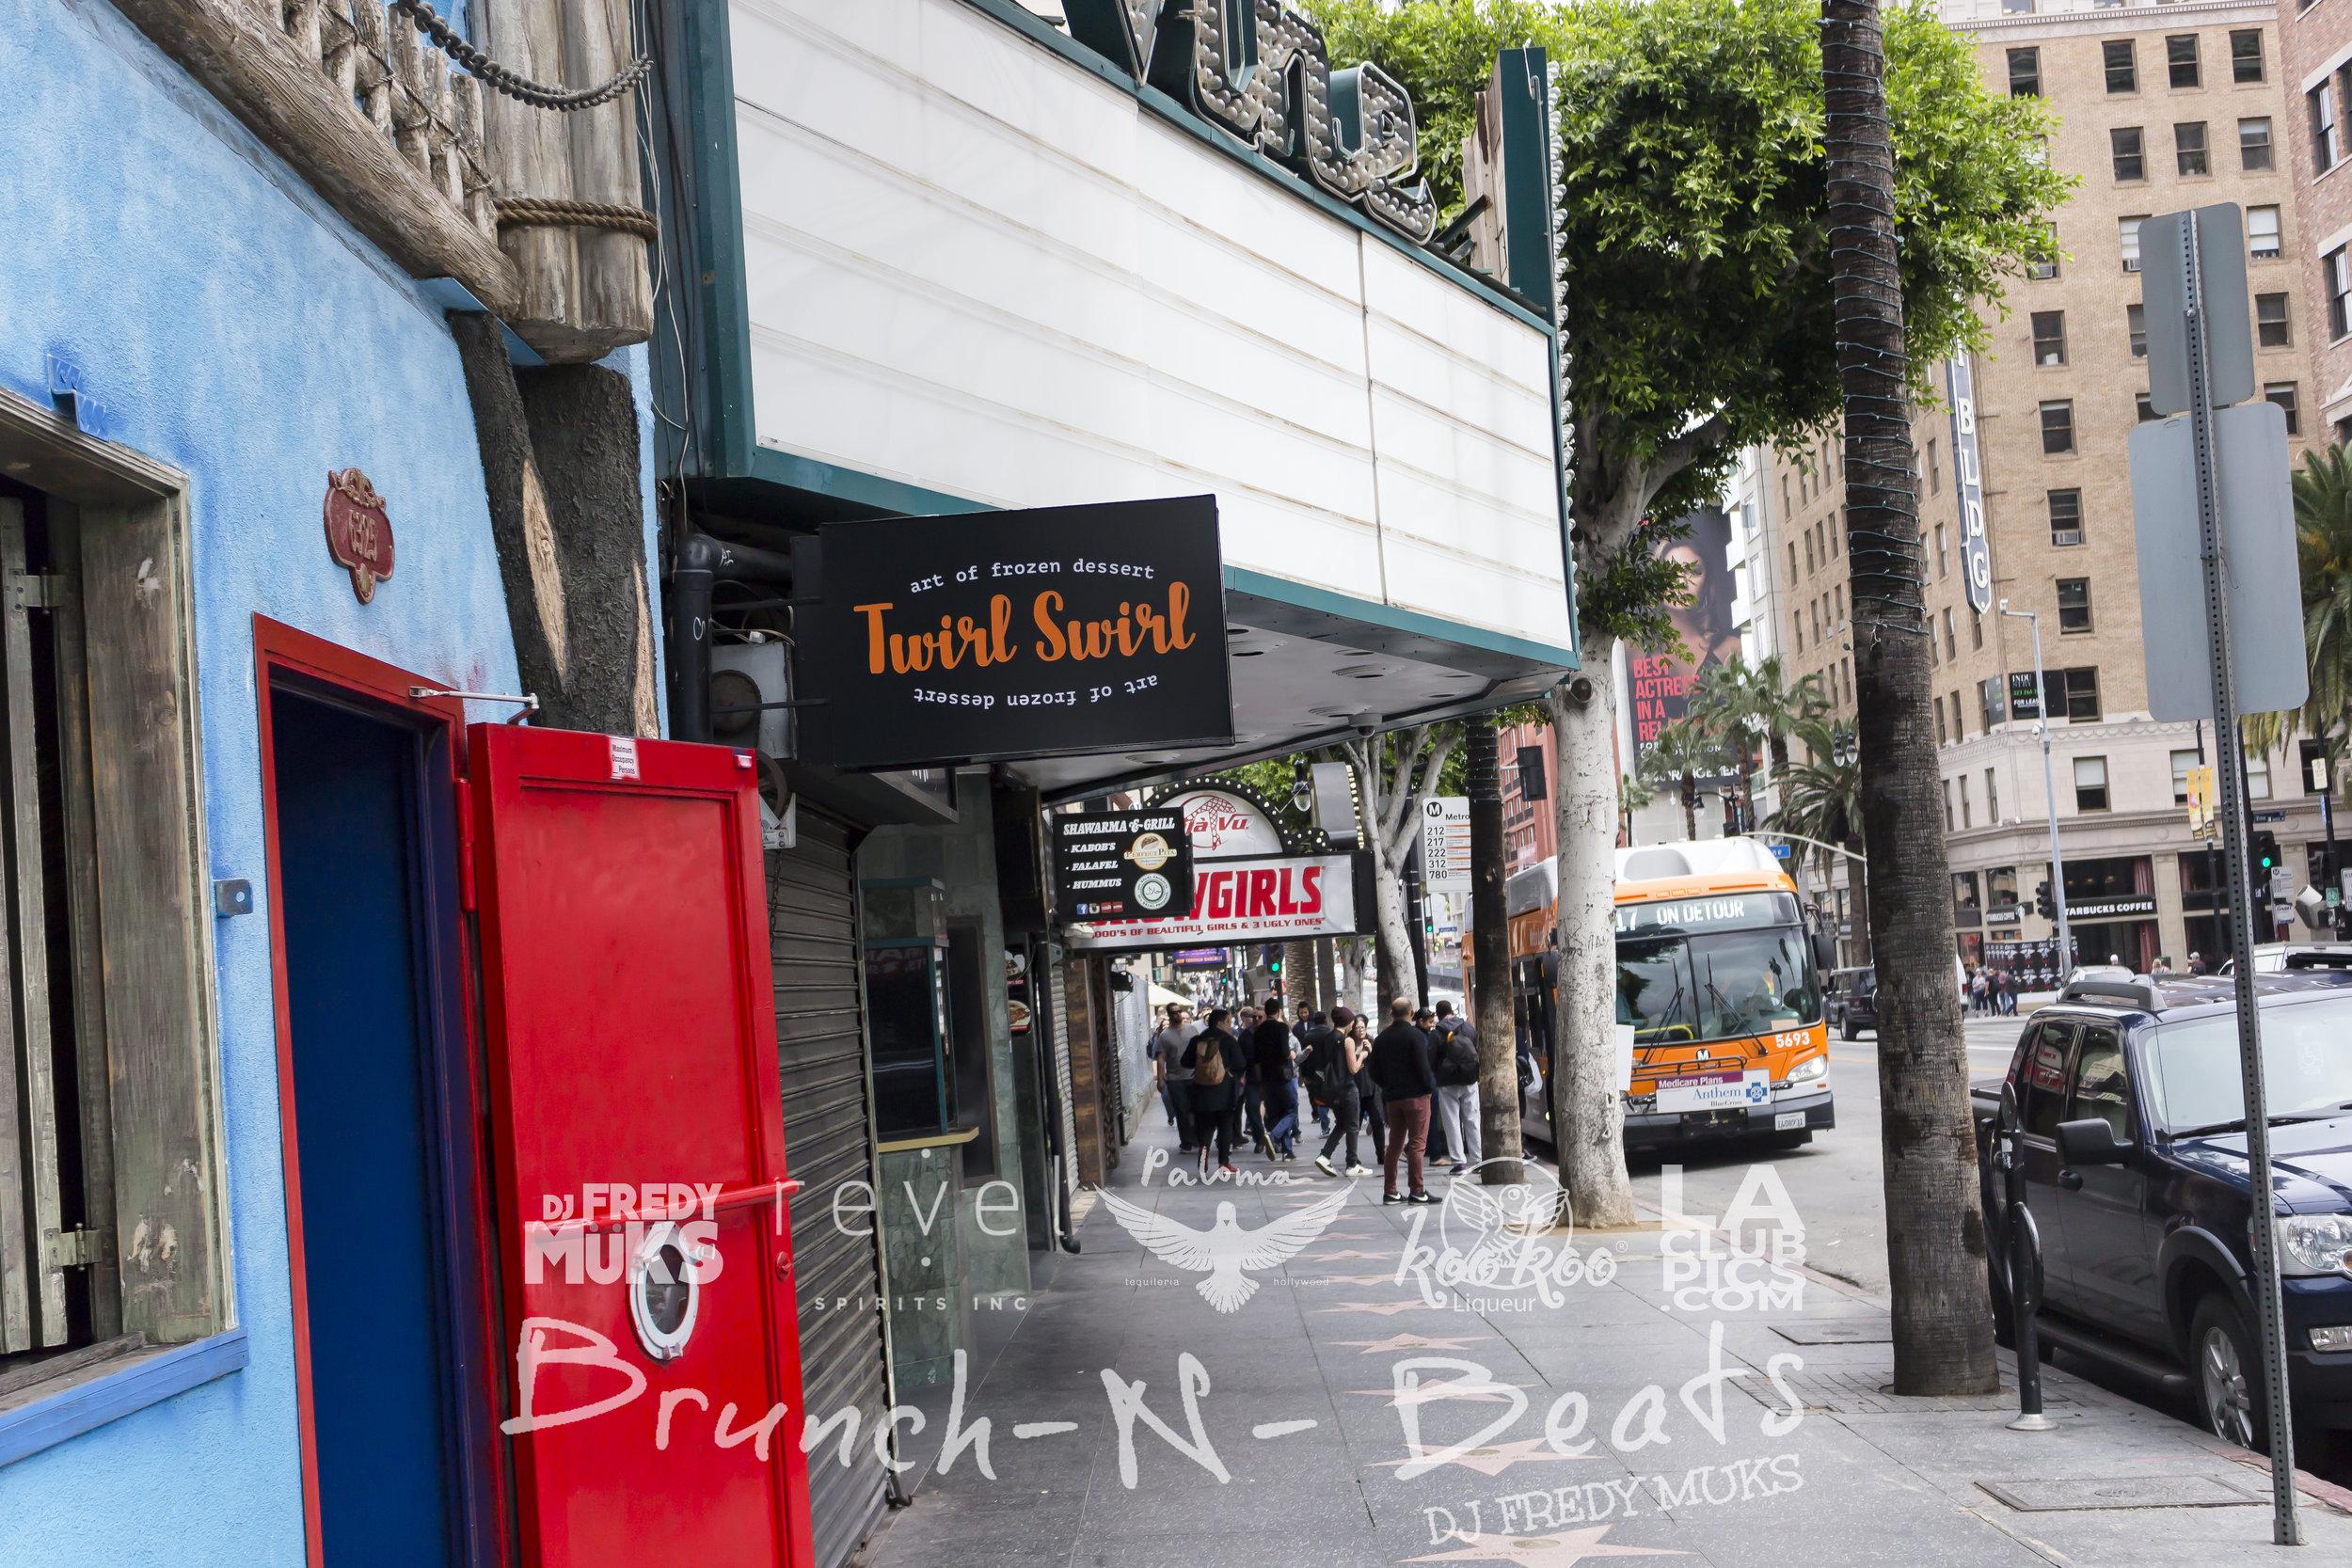 Brunch-N-Beats - 03-11-18_78.jpg